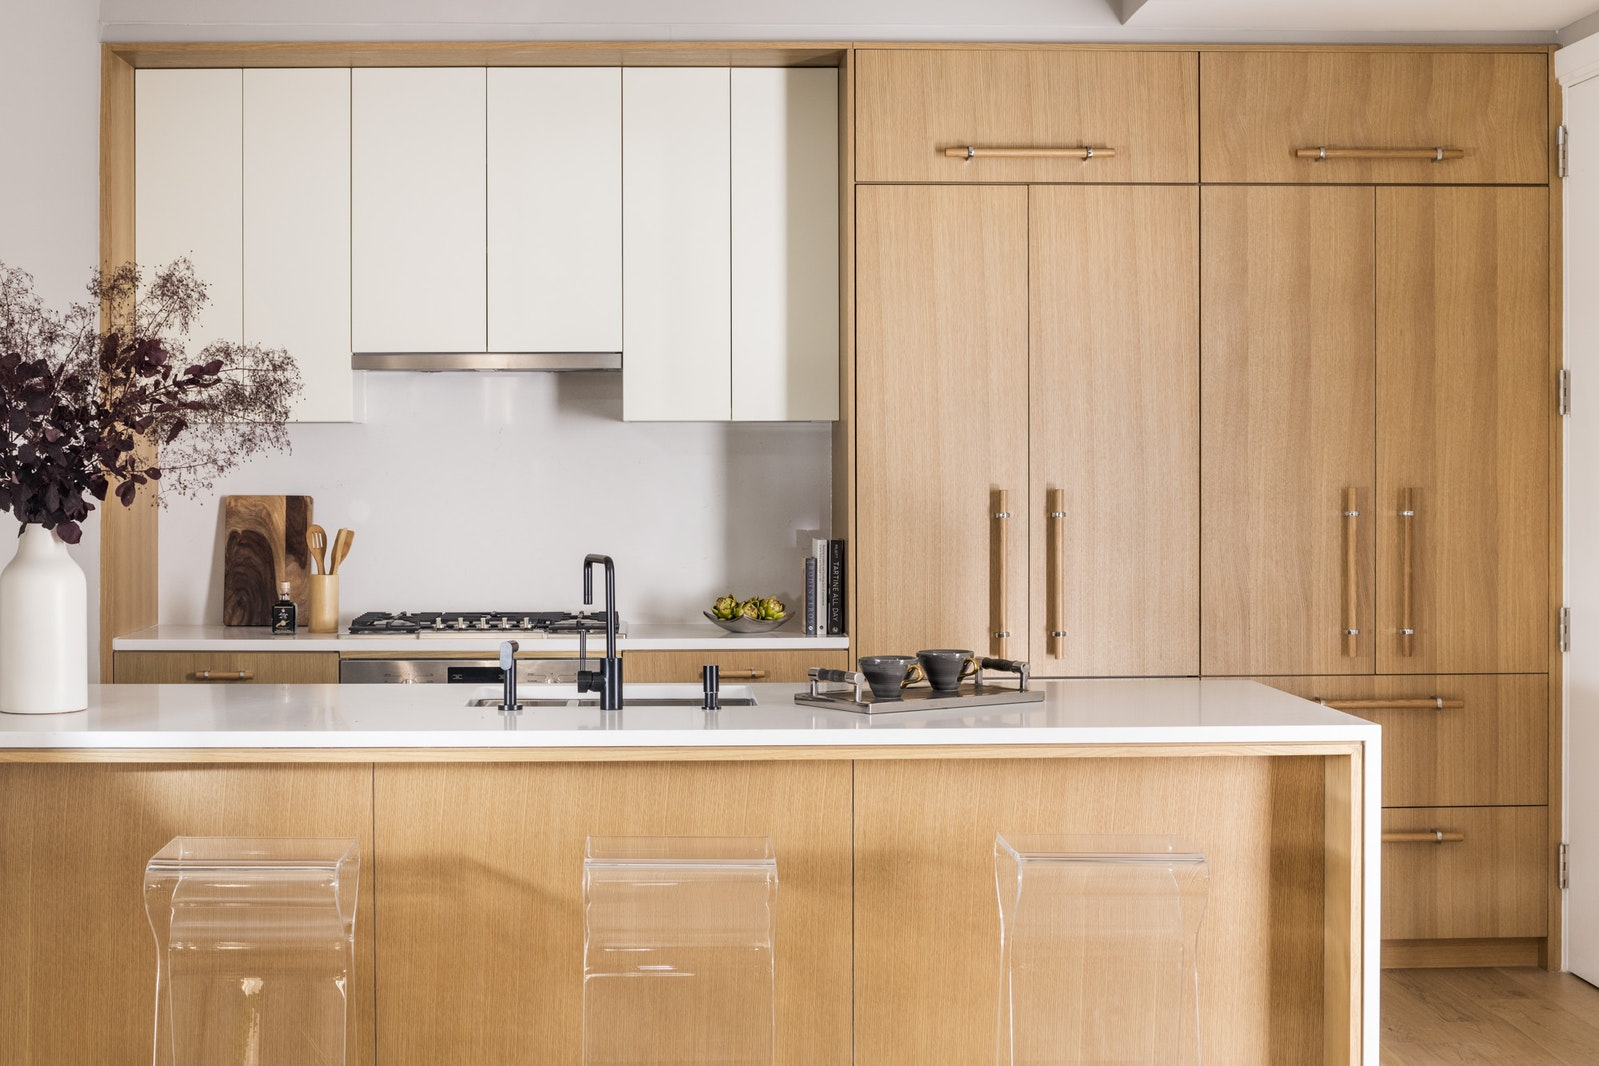 Apartment for sale at 2218 Jackson Avenue, Apt 1001